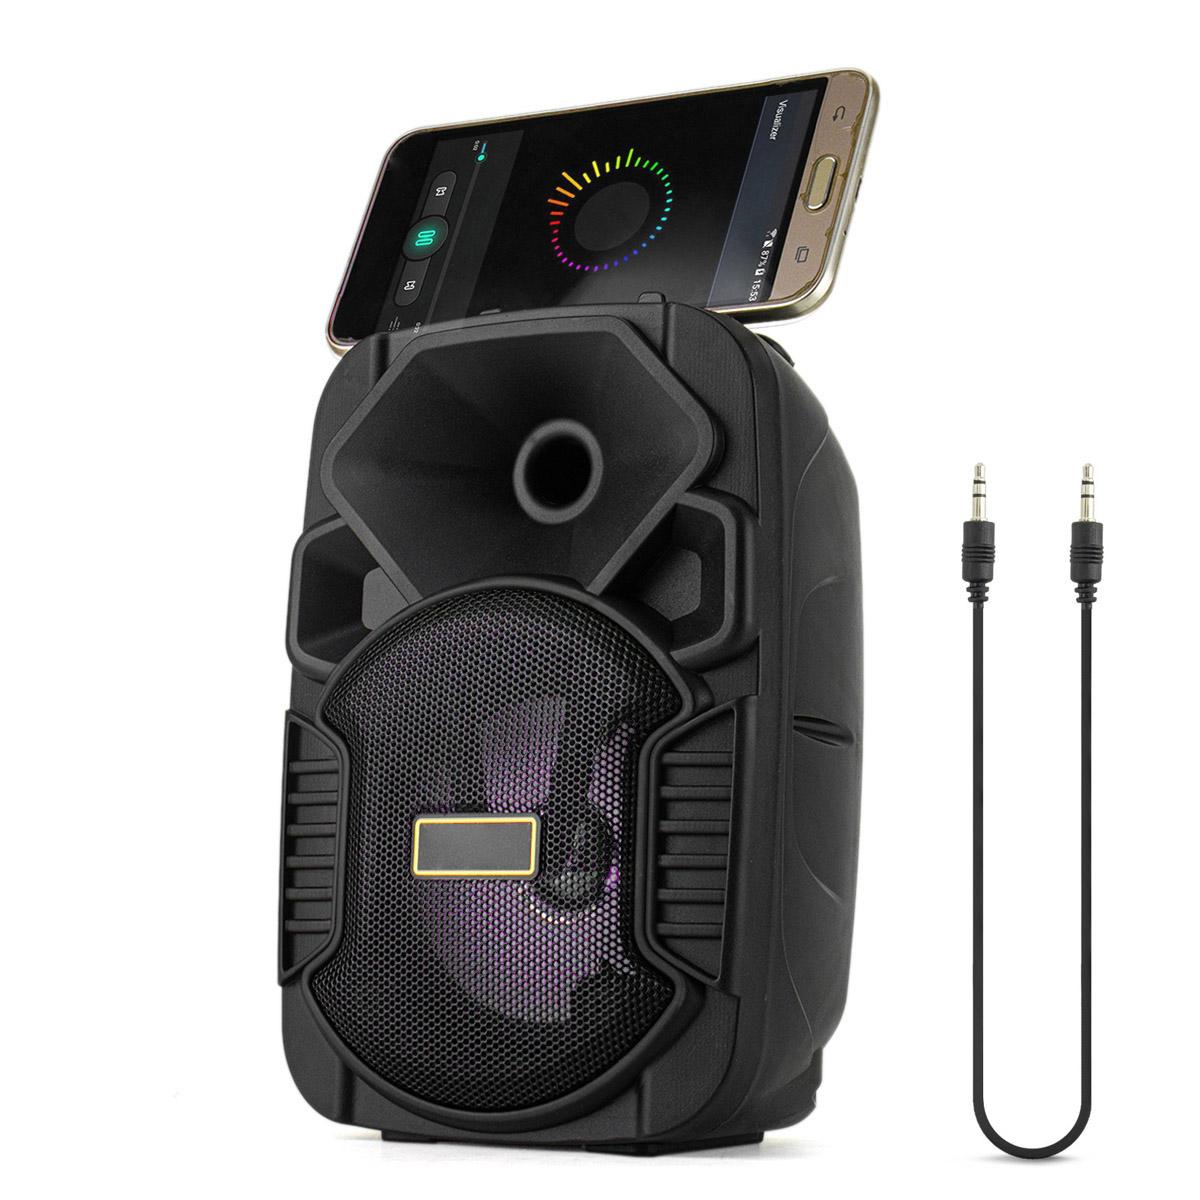 Caixa de Som Bluetooth Portátil 5 Watts RMS com Cabo Auxiliar P2 Entrada USB Micro SD XTrad XDG-54